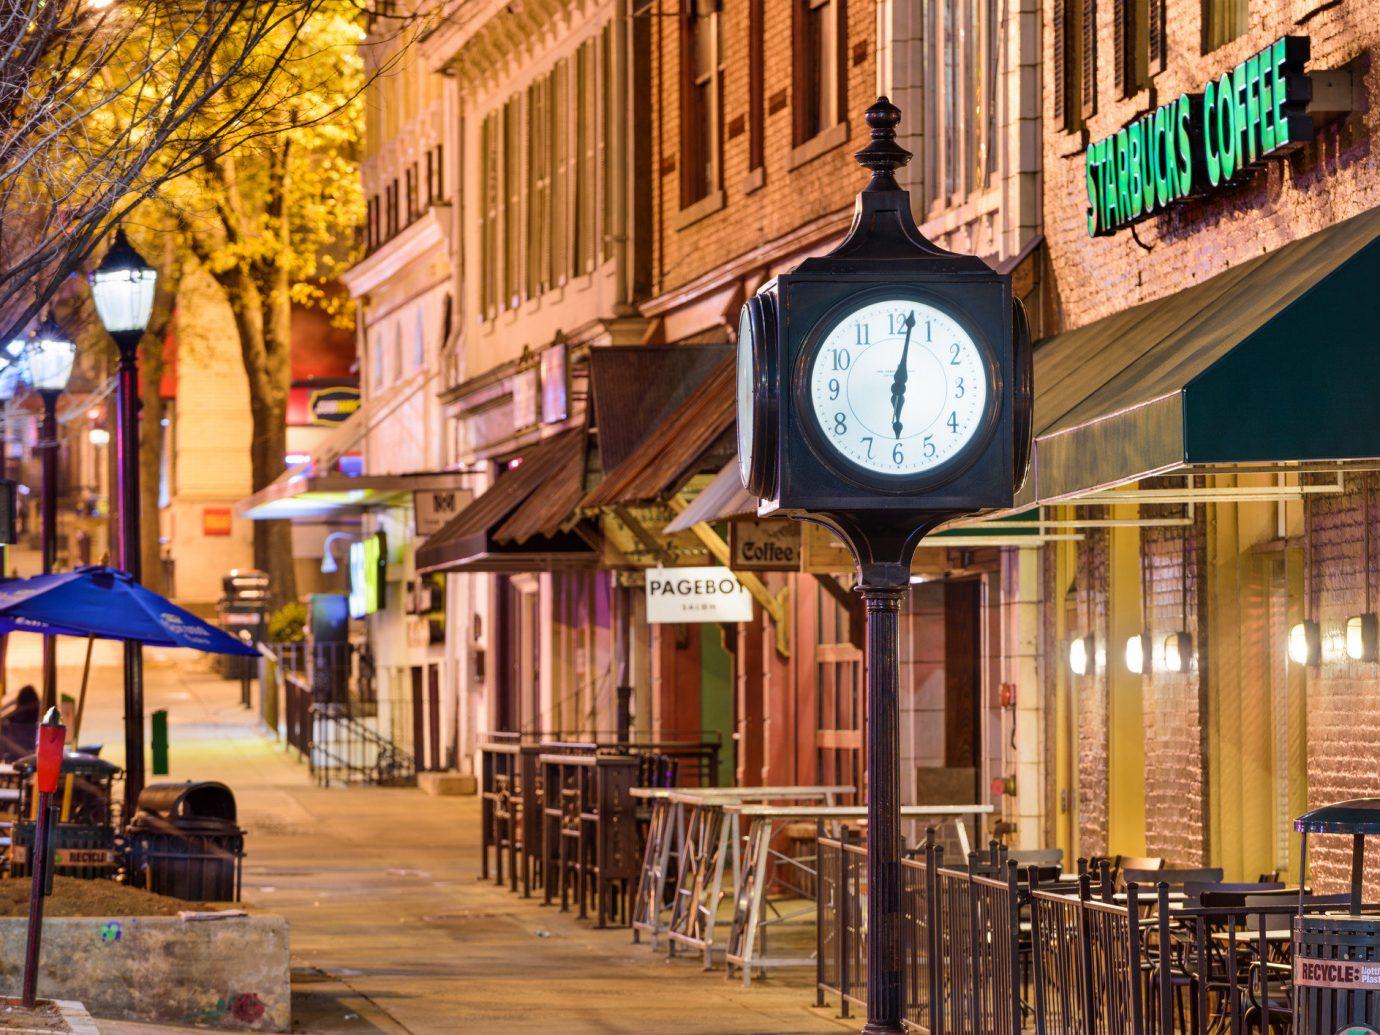 Trip Ideas landmark Town City neighbourhood street Downtown night metropolis metropolitan area evening building mixed use facade marketplace